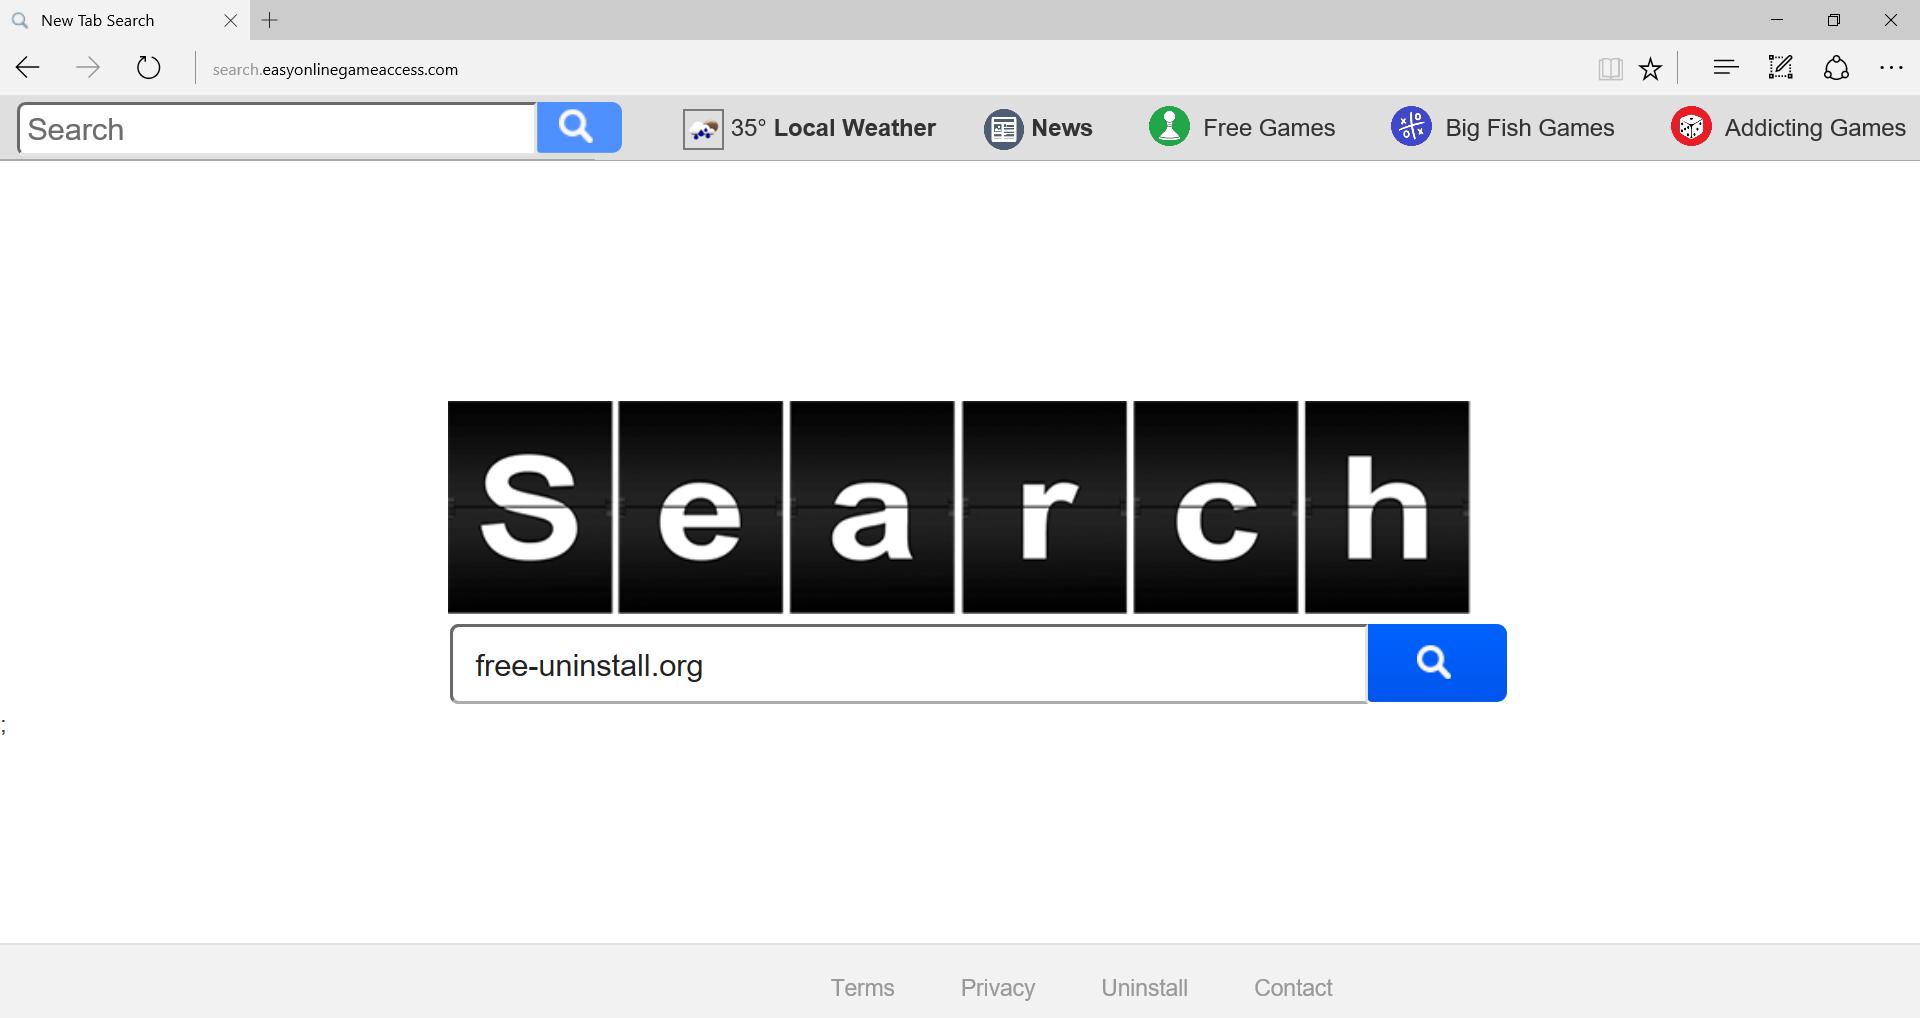 Search.easyonlinegameaccess.com Hijacker